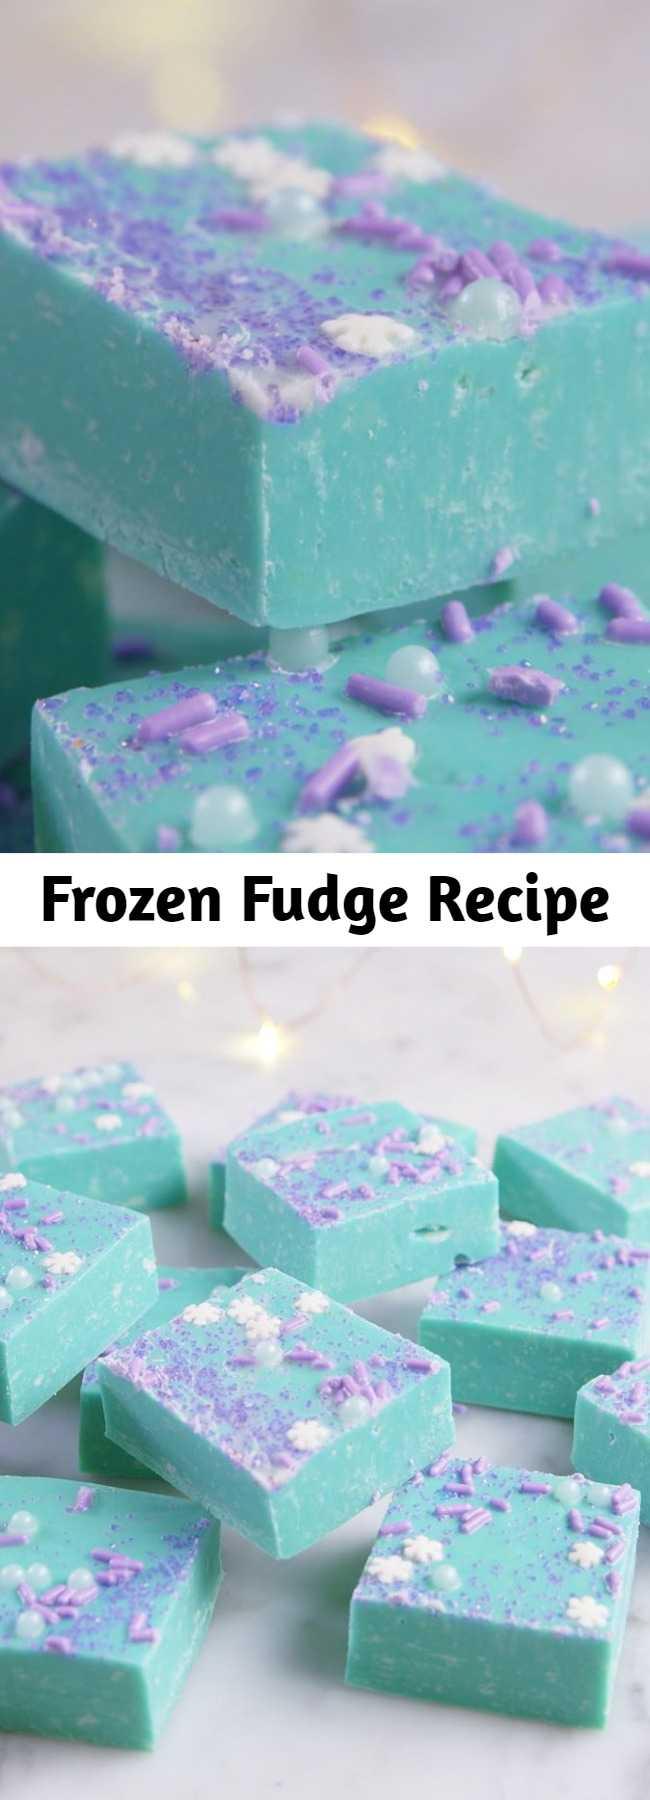 Frozen Fudge Recipe - Even Elsa couldn't resist this fudge. #kids #dessert #frozen #fudge #baking